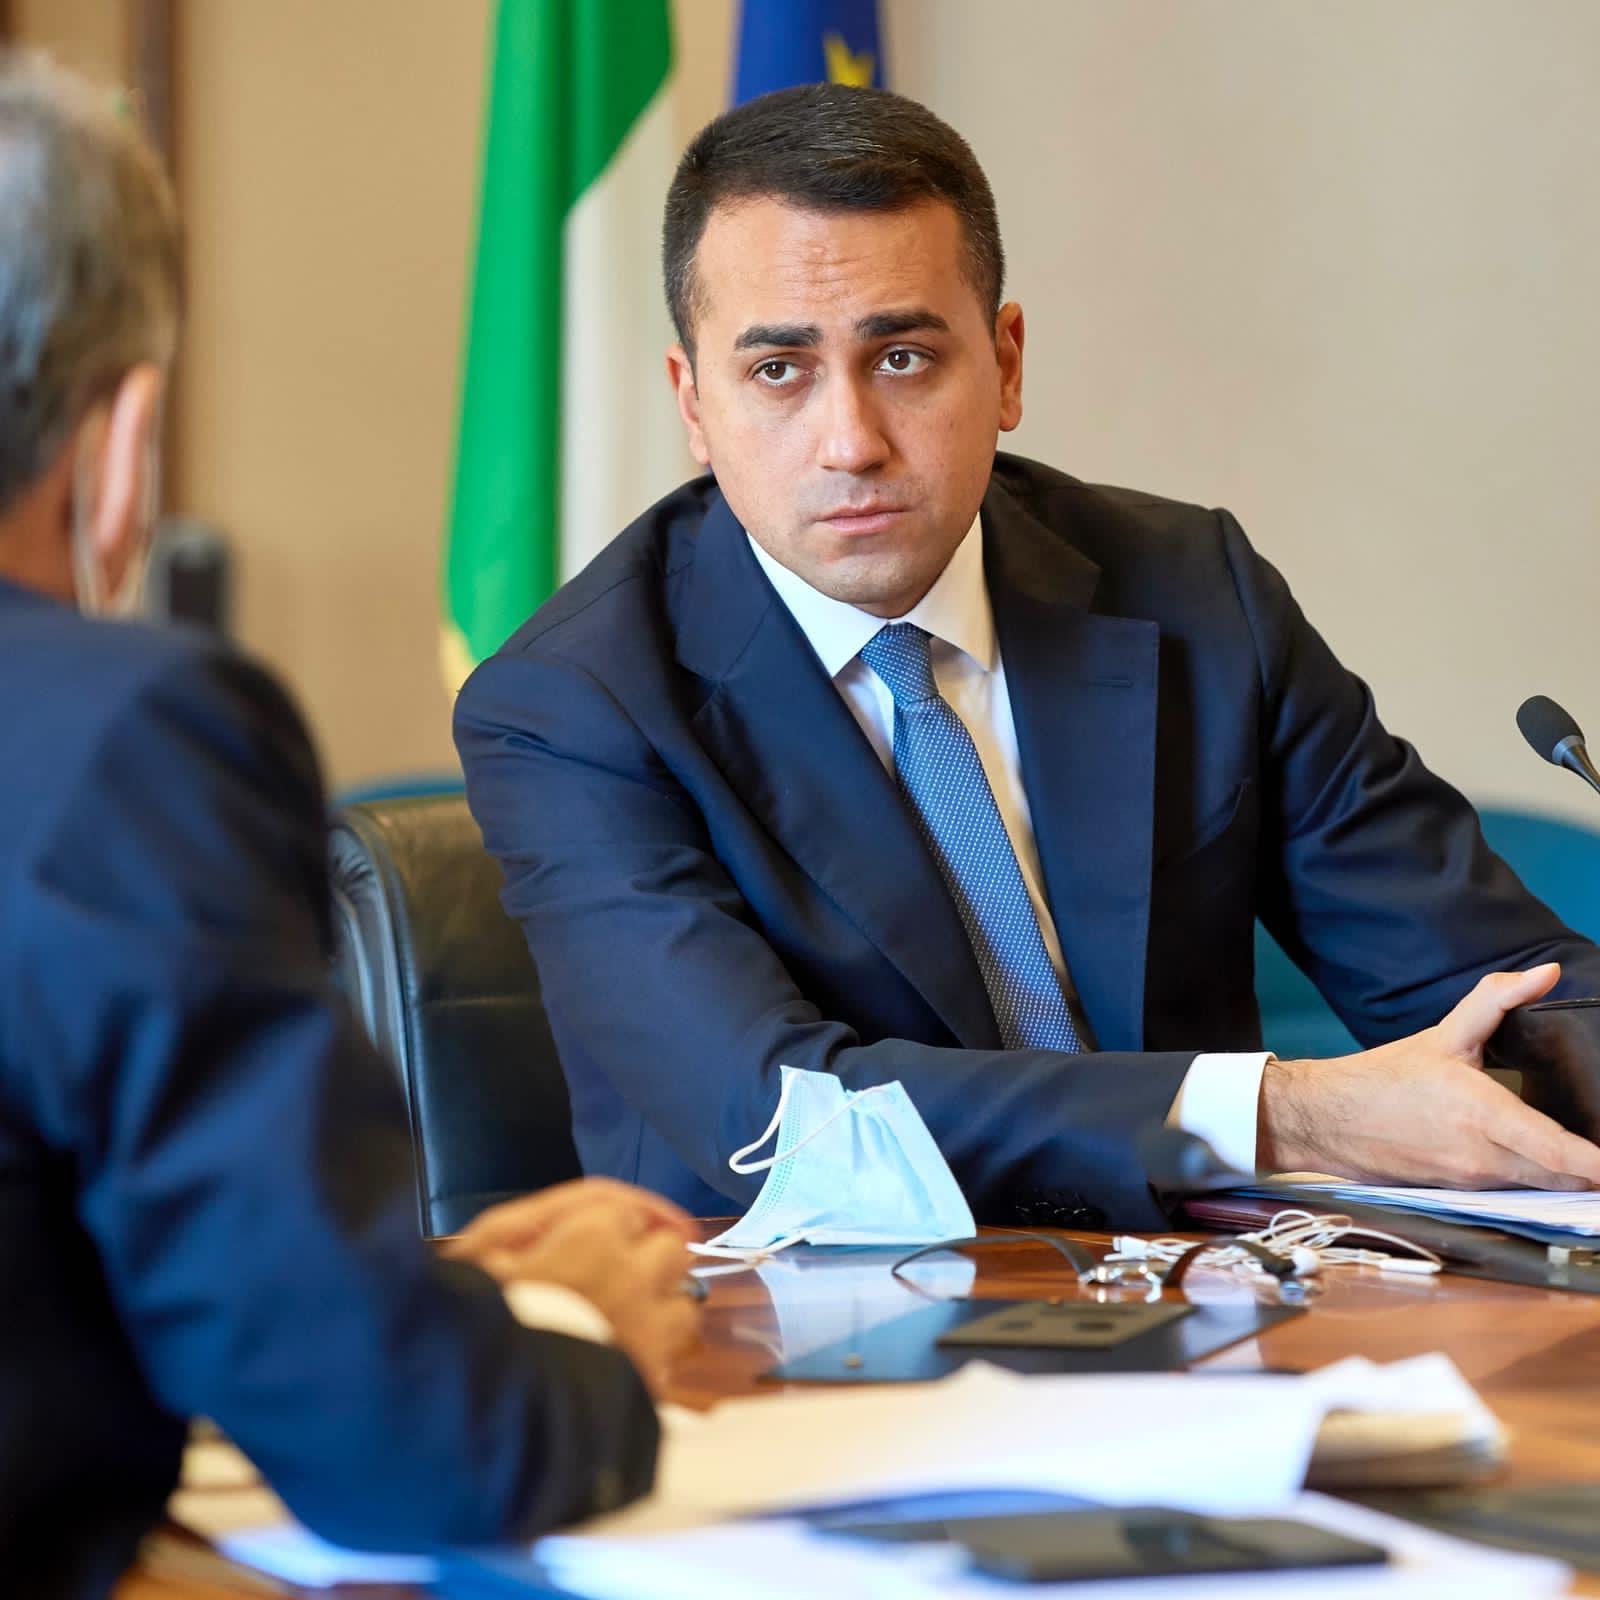 Di Maio breaks into debate among Italian progressives, as they look to Biden